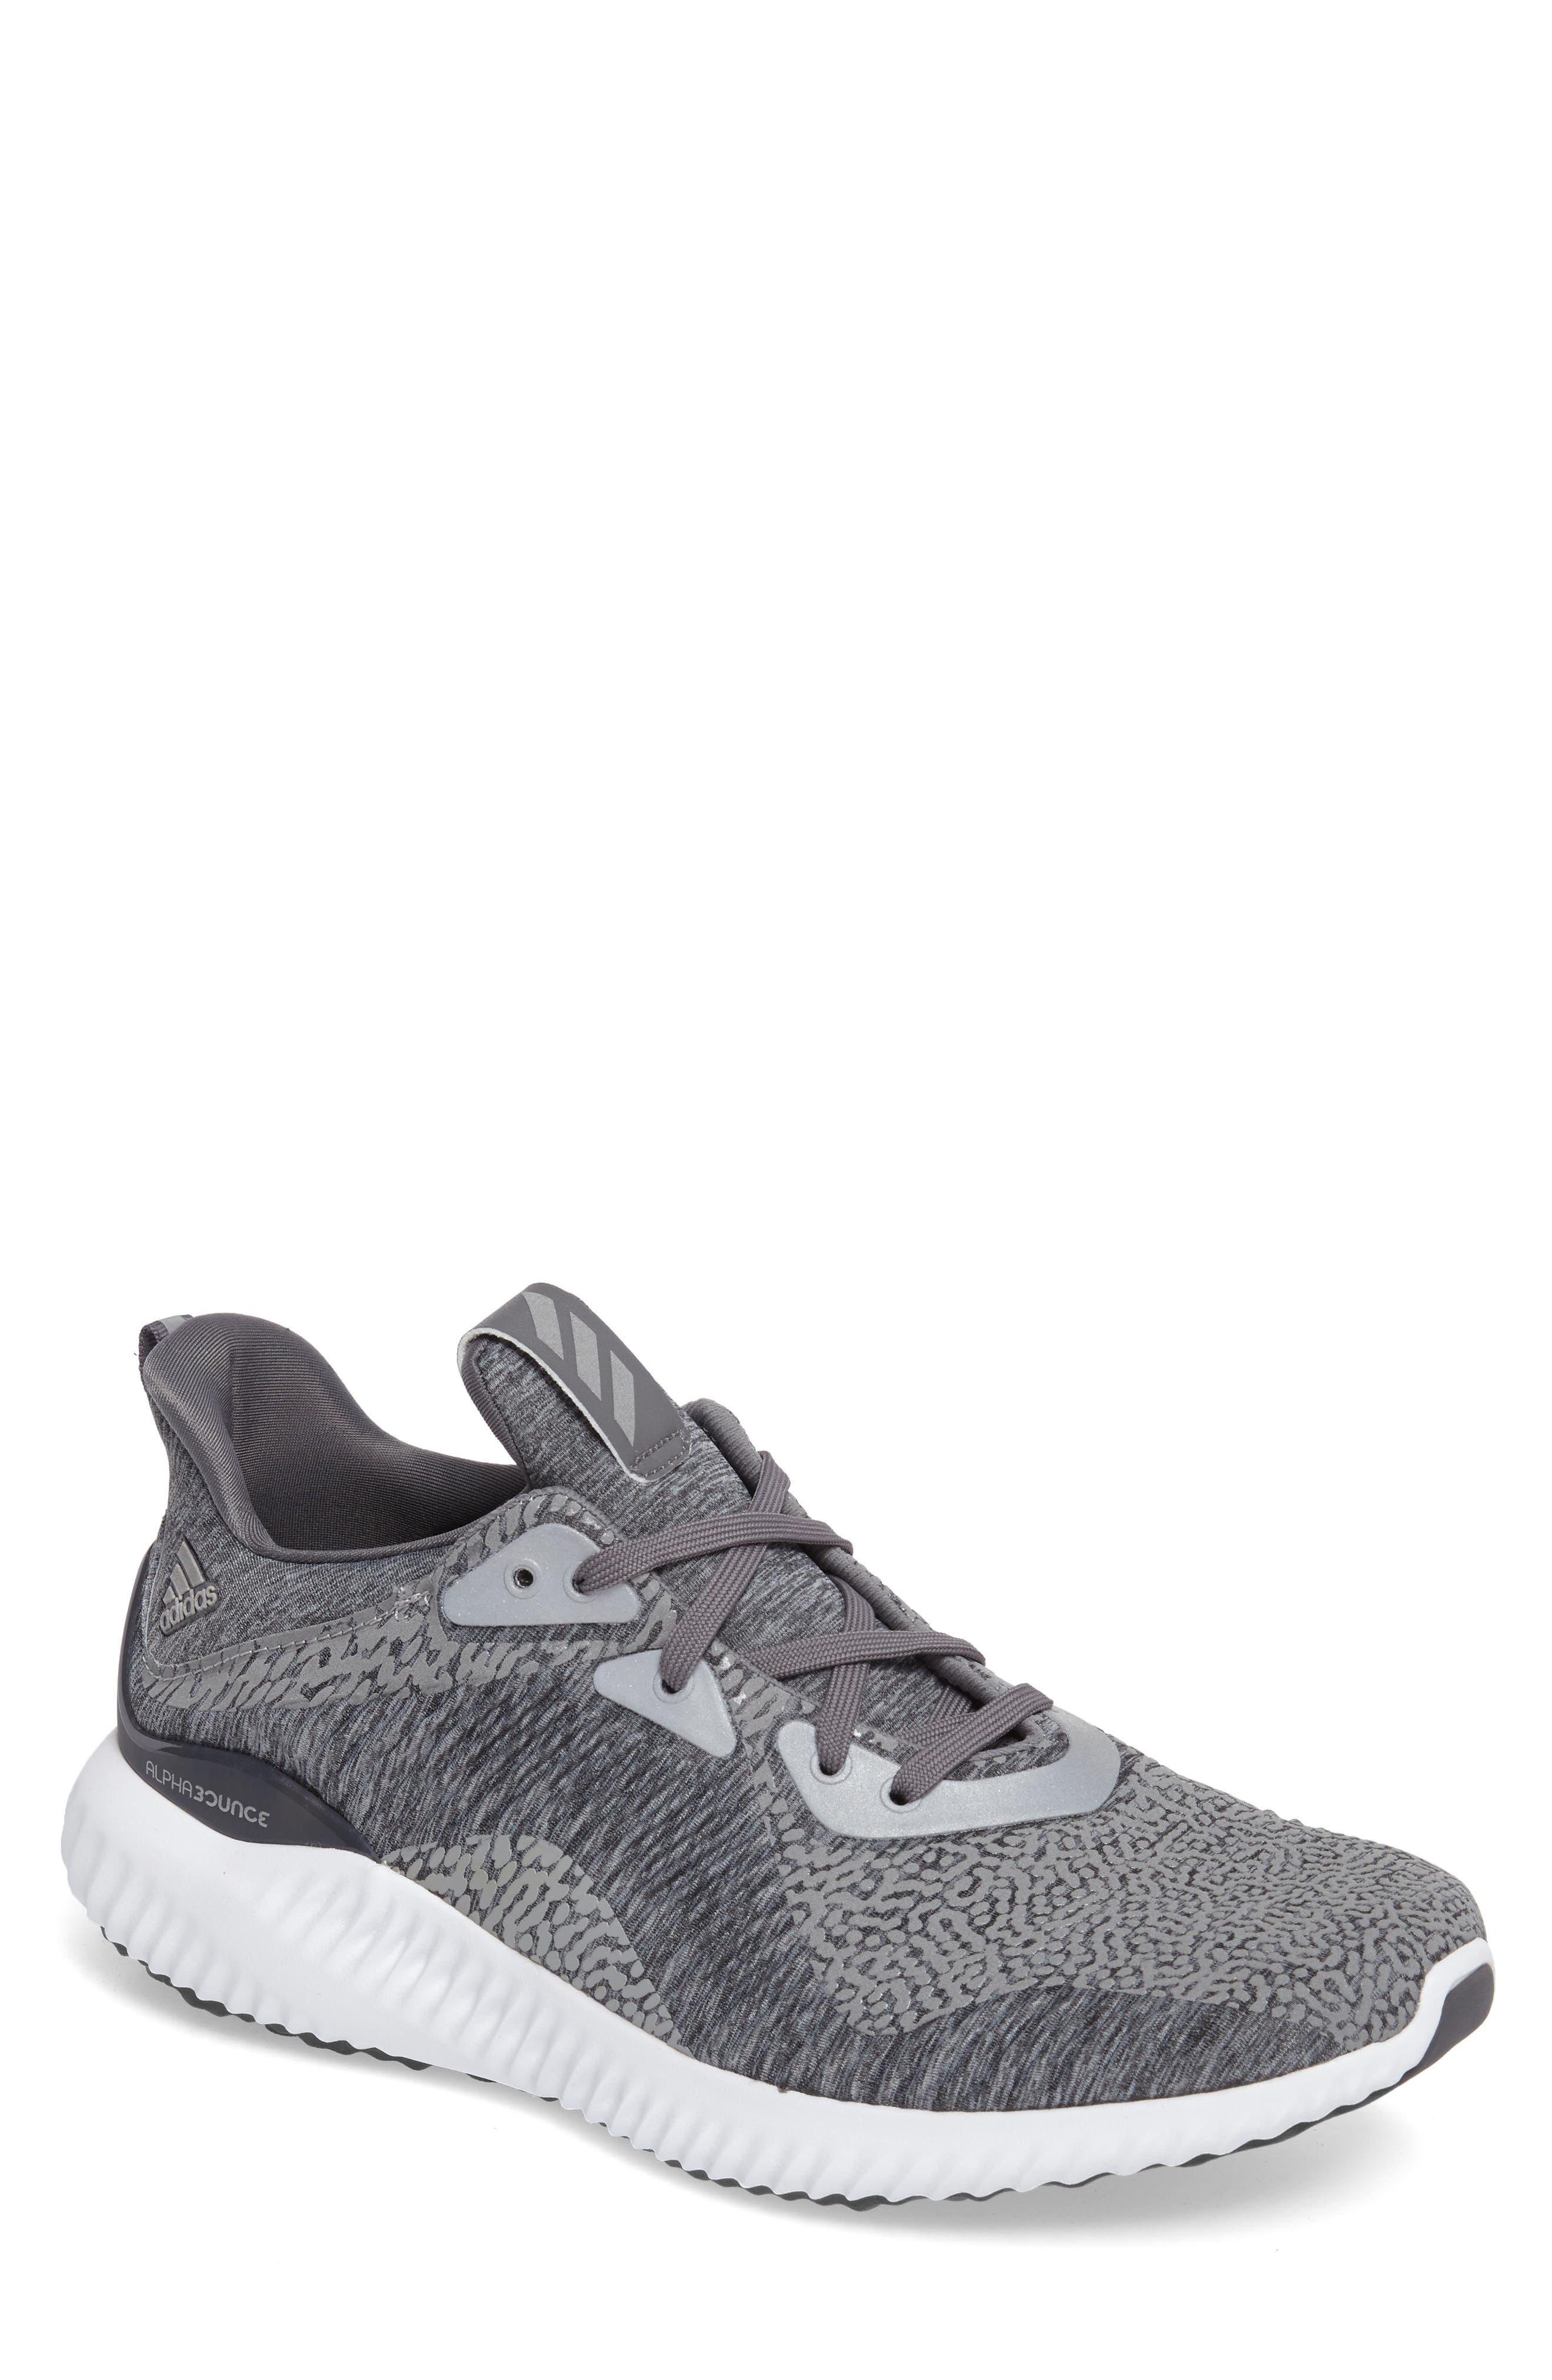 Alternate Image 1 Selected - adidas AlphaBounce Aramis Sneaker (Men)